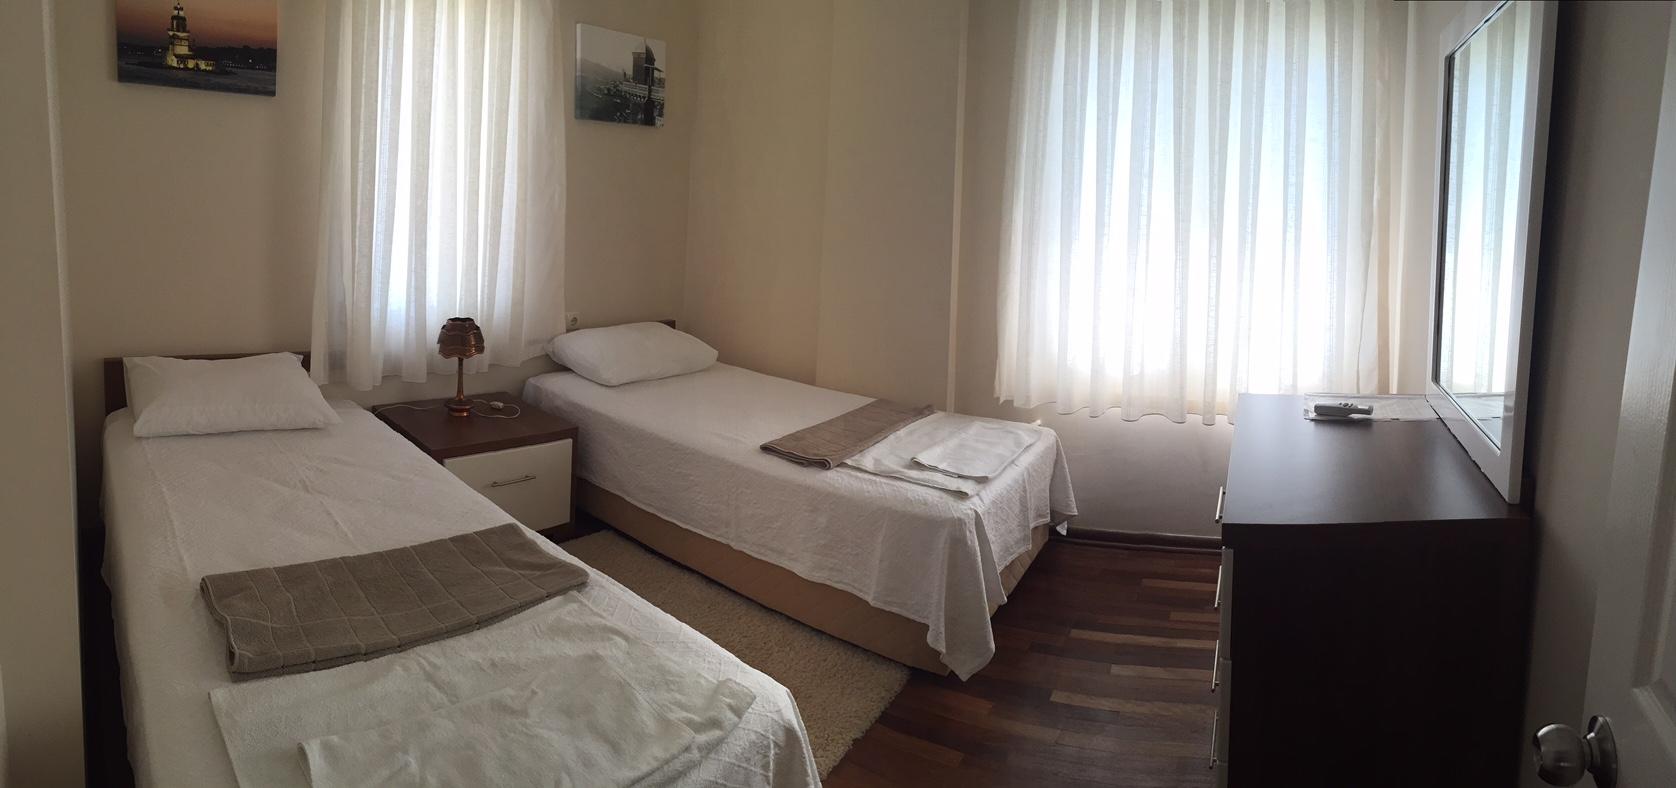 Bedroom 3_Panaromic.JPG